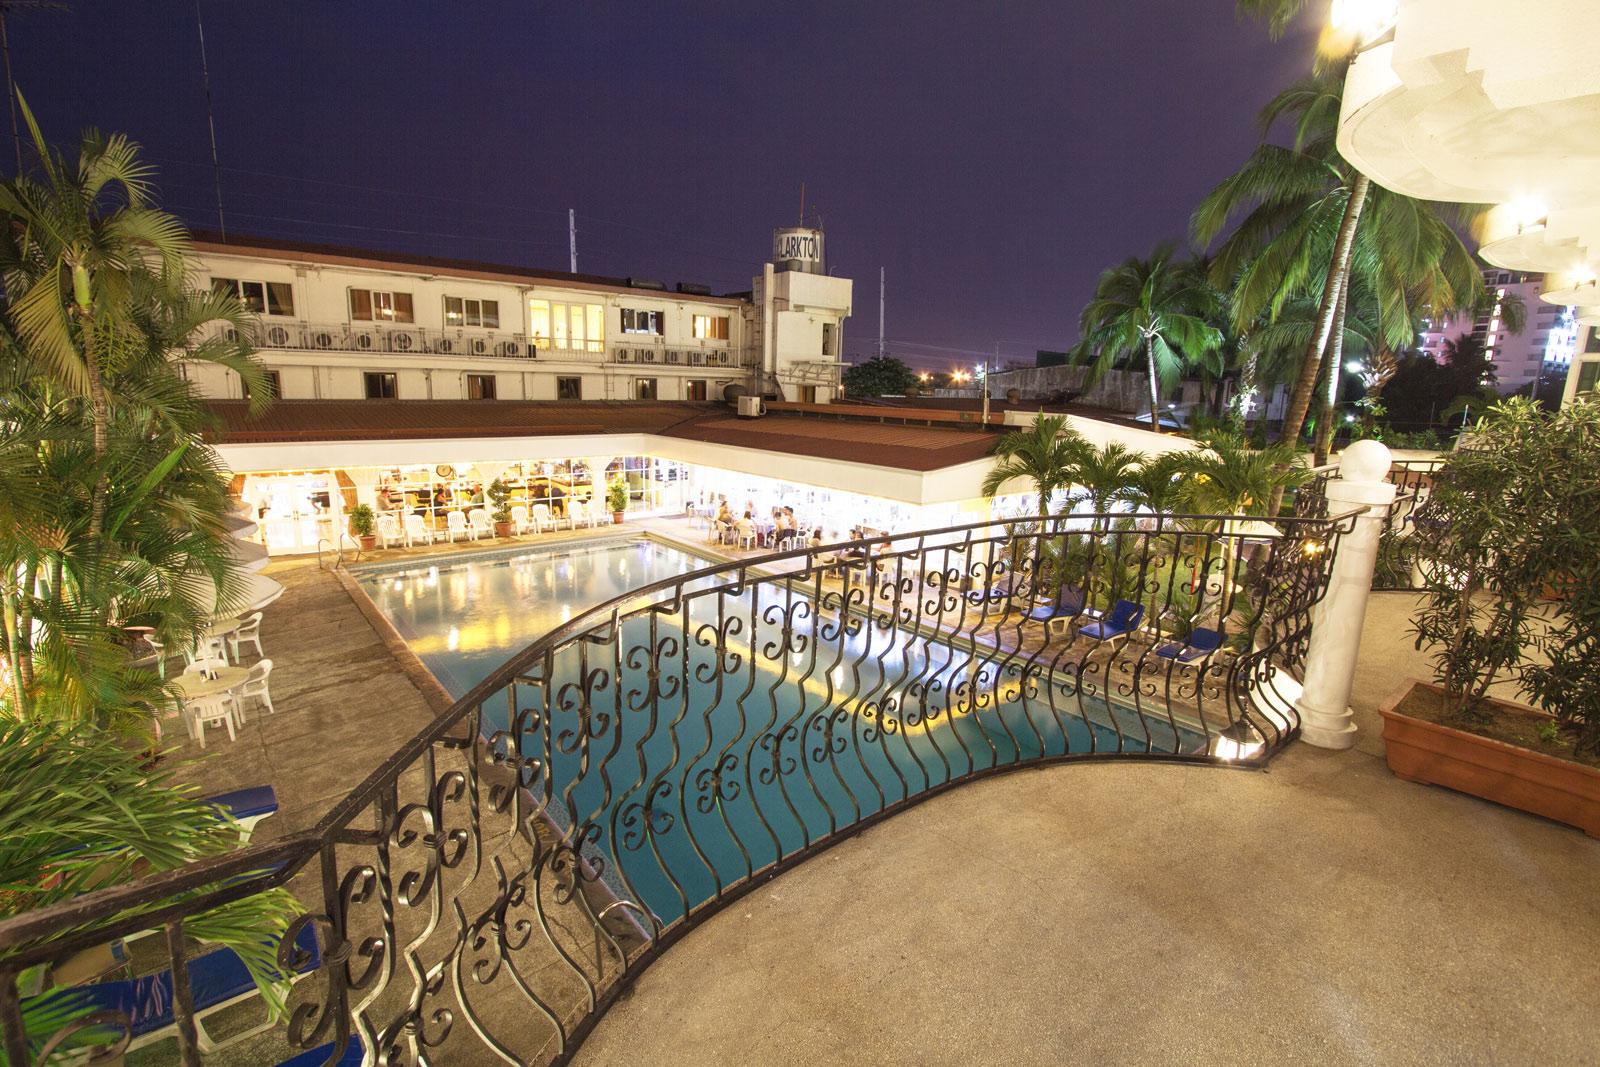 Clarkton Hotel Angeles Studio Loft 404 6